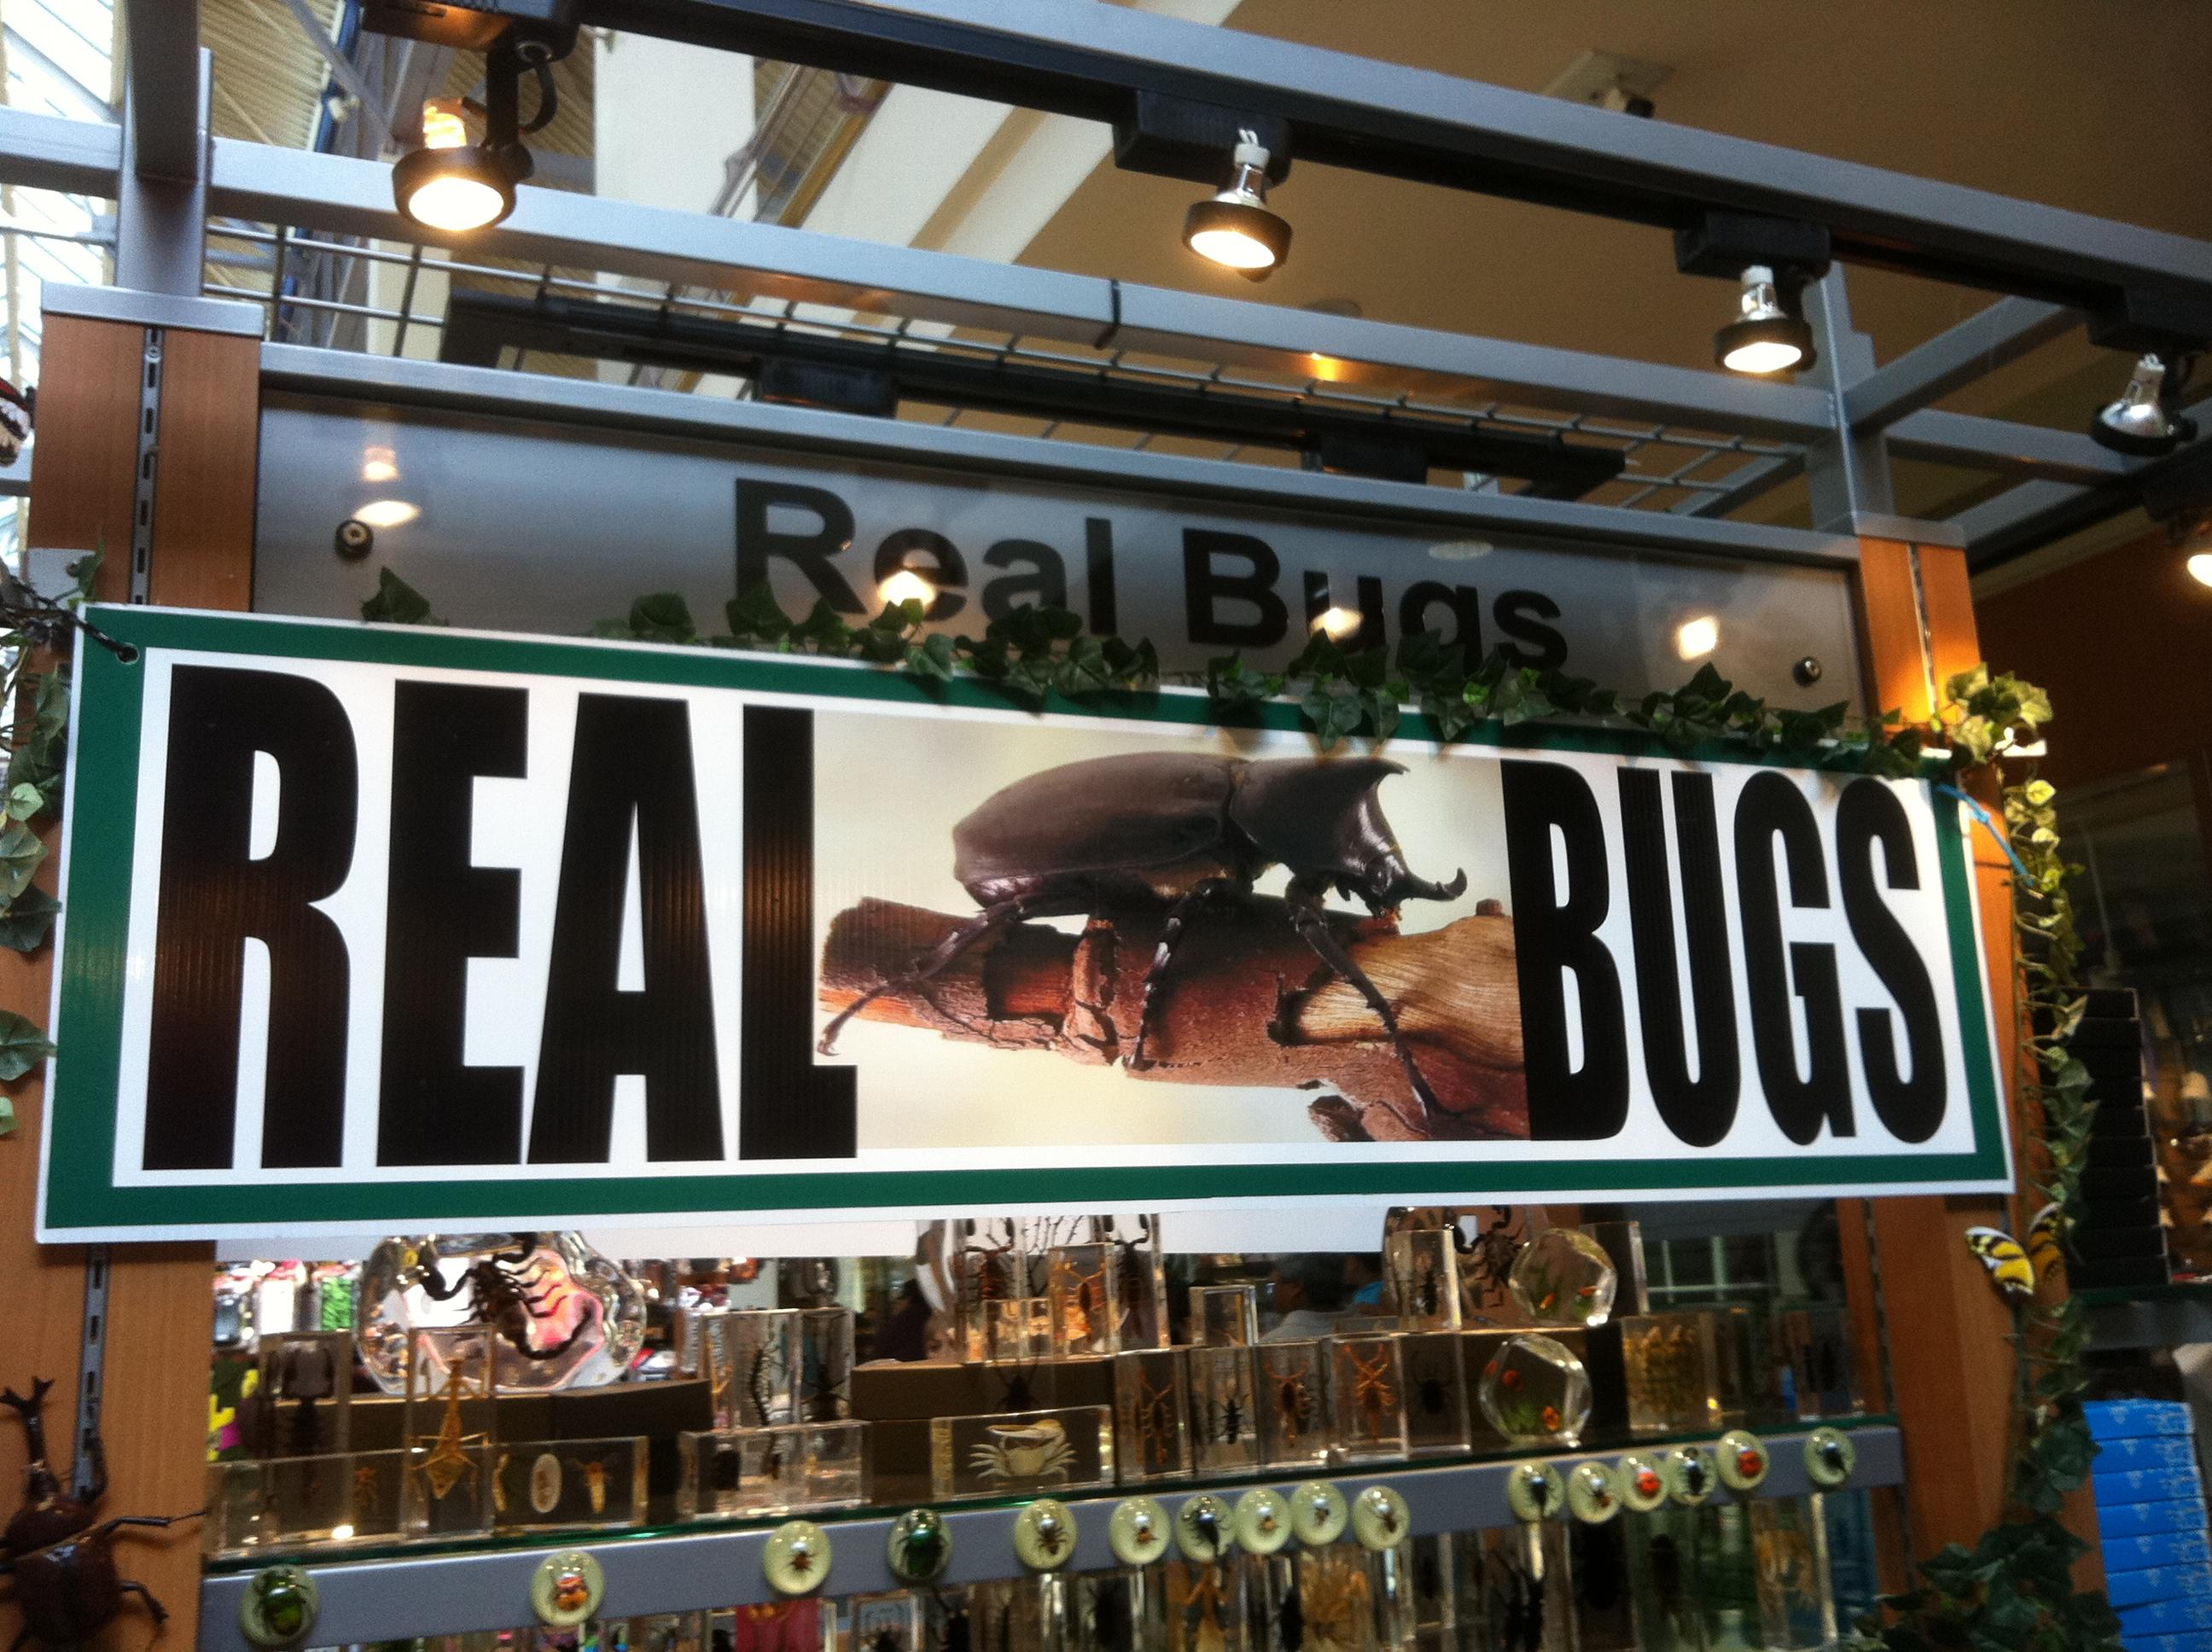 Real Bugs Kiosk